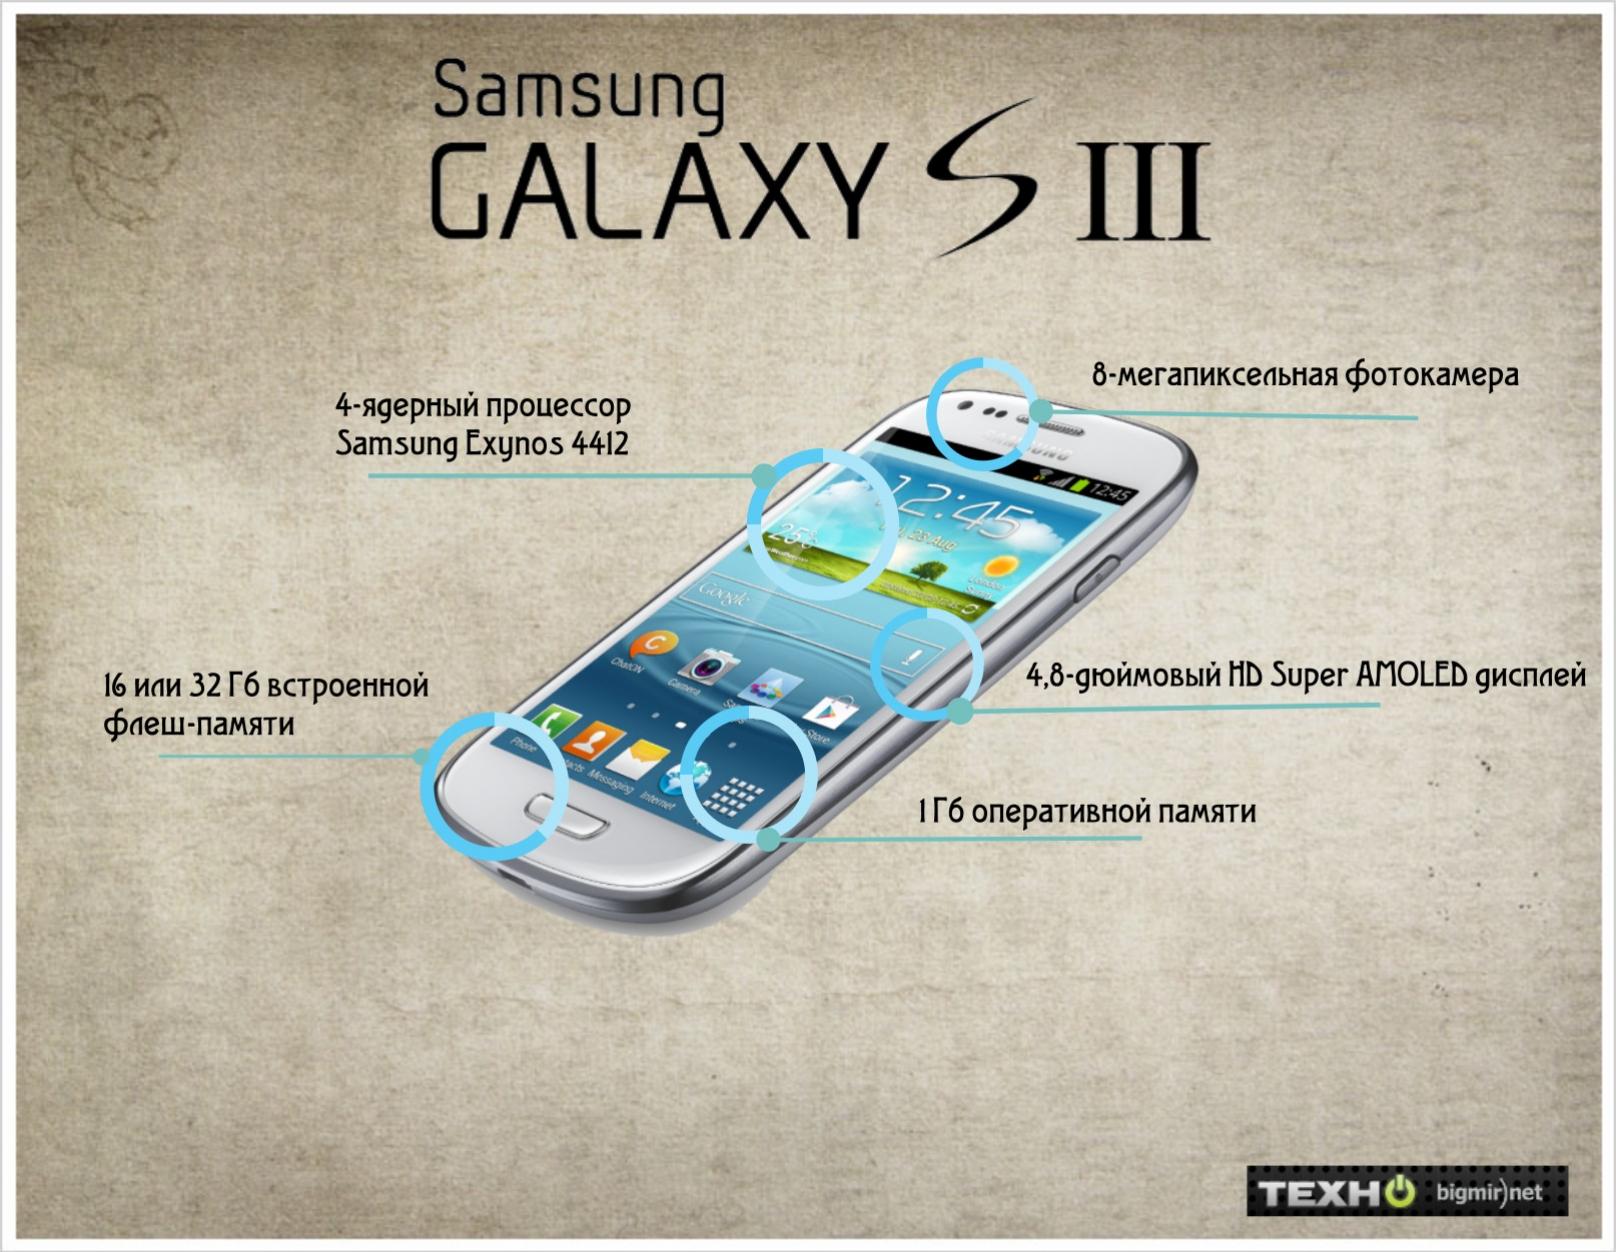 Samsung Galaxy S3 характеристики